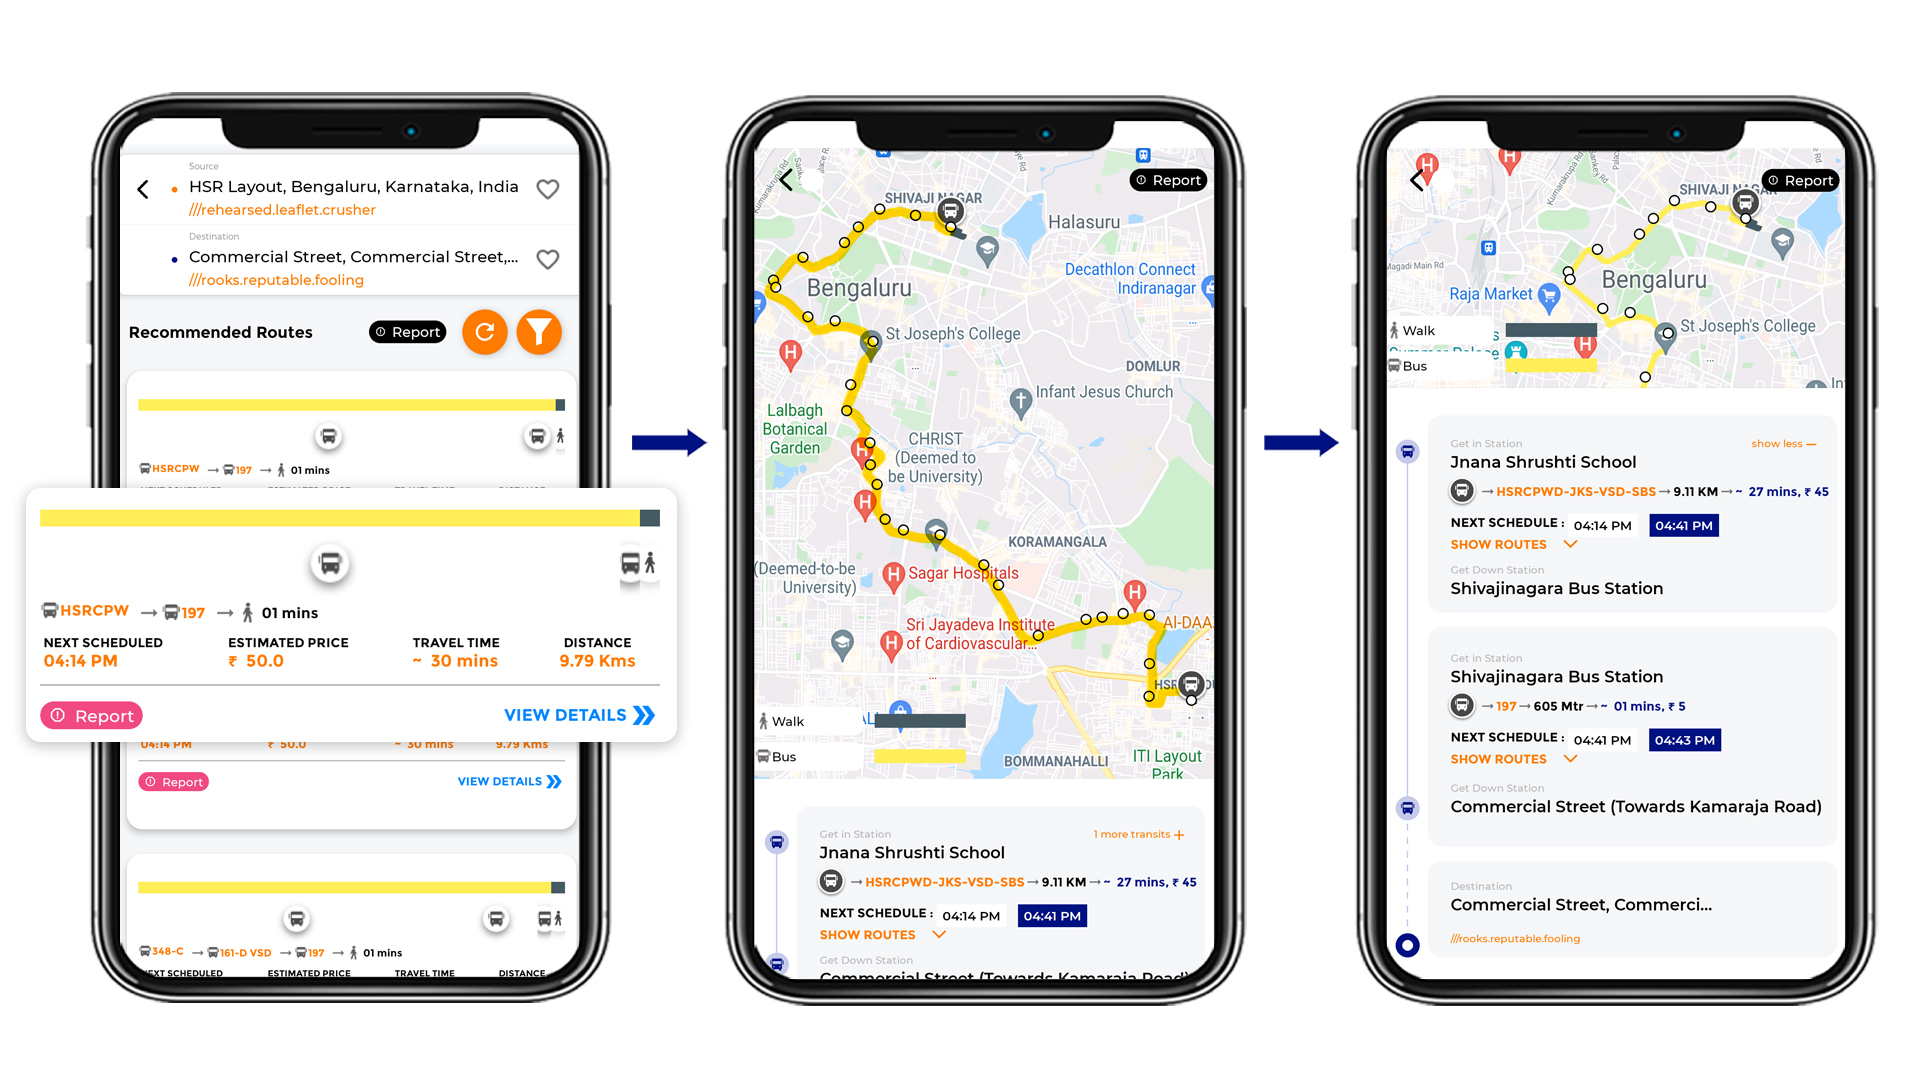 Tummoc, Tummoc app, Public Transport Information, Commercial street, HSR Layout